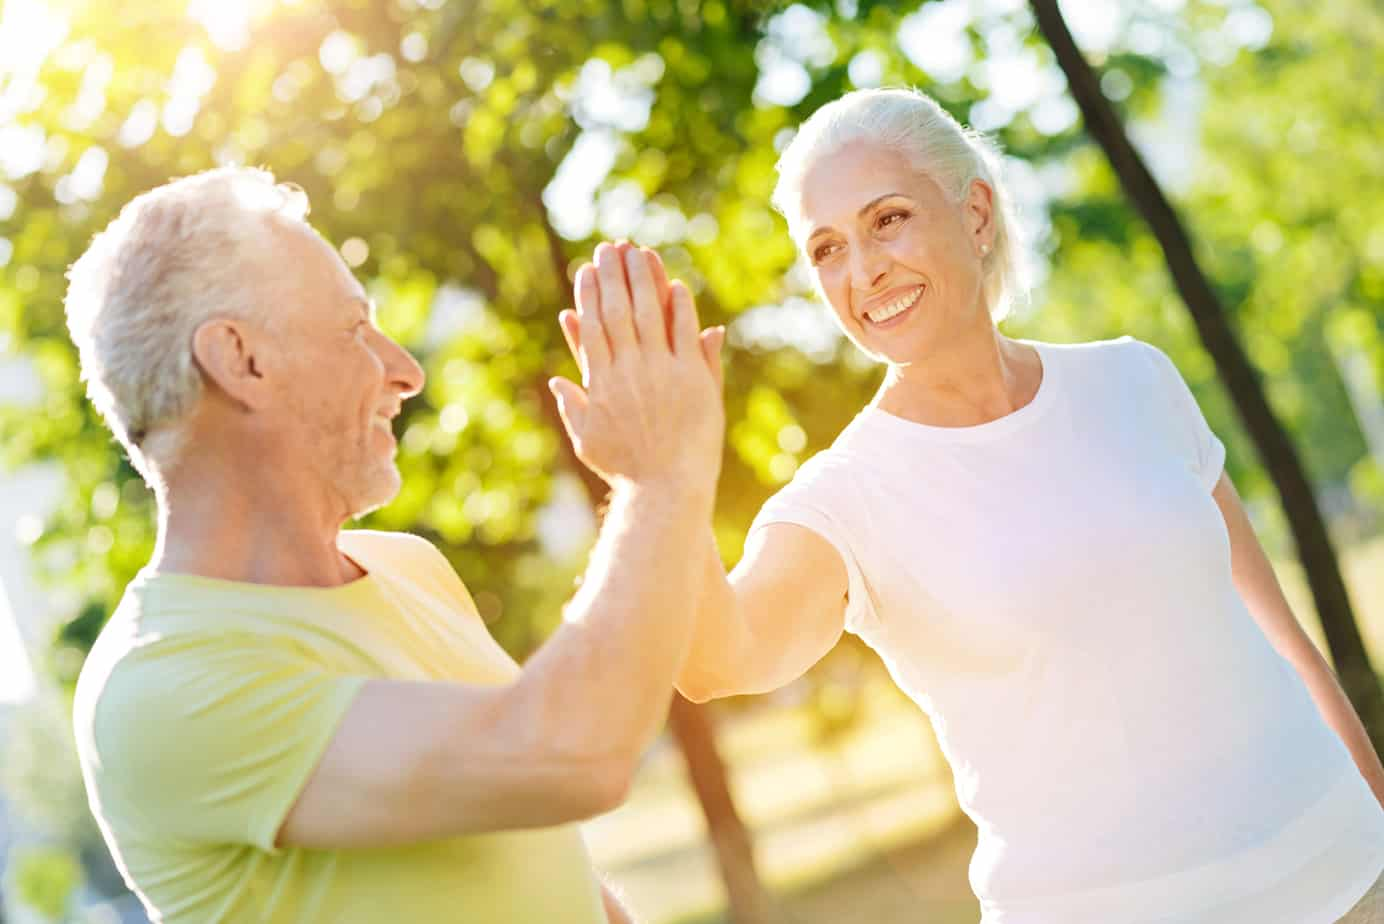 coppia di anziani felici ed energetici